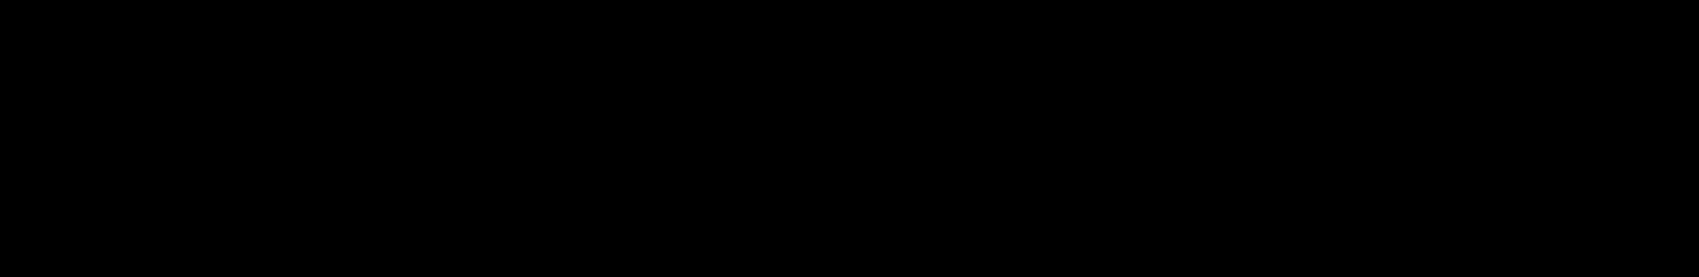 The Telegraph logo.png